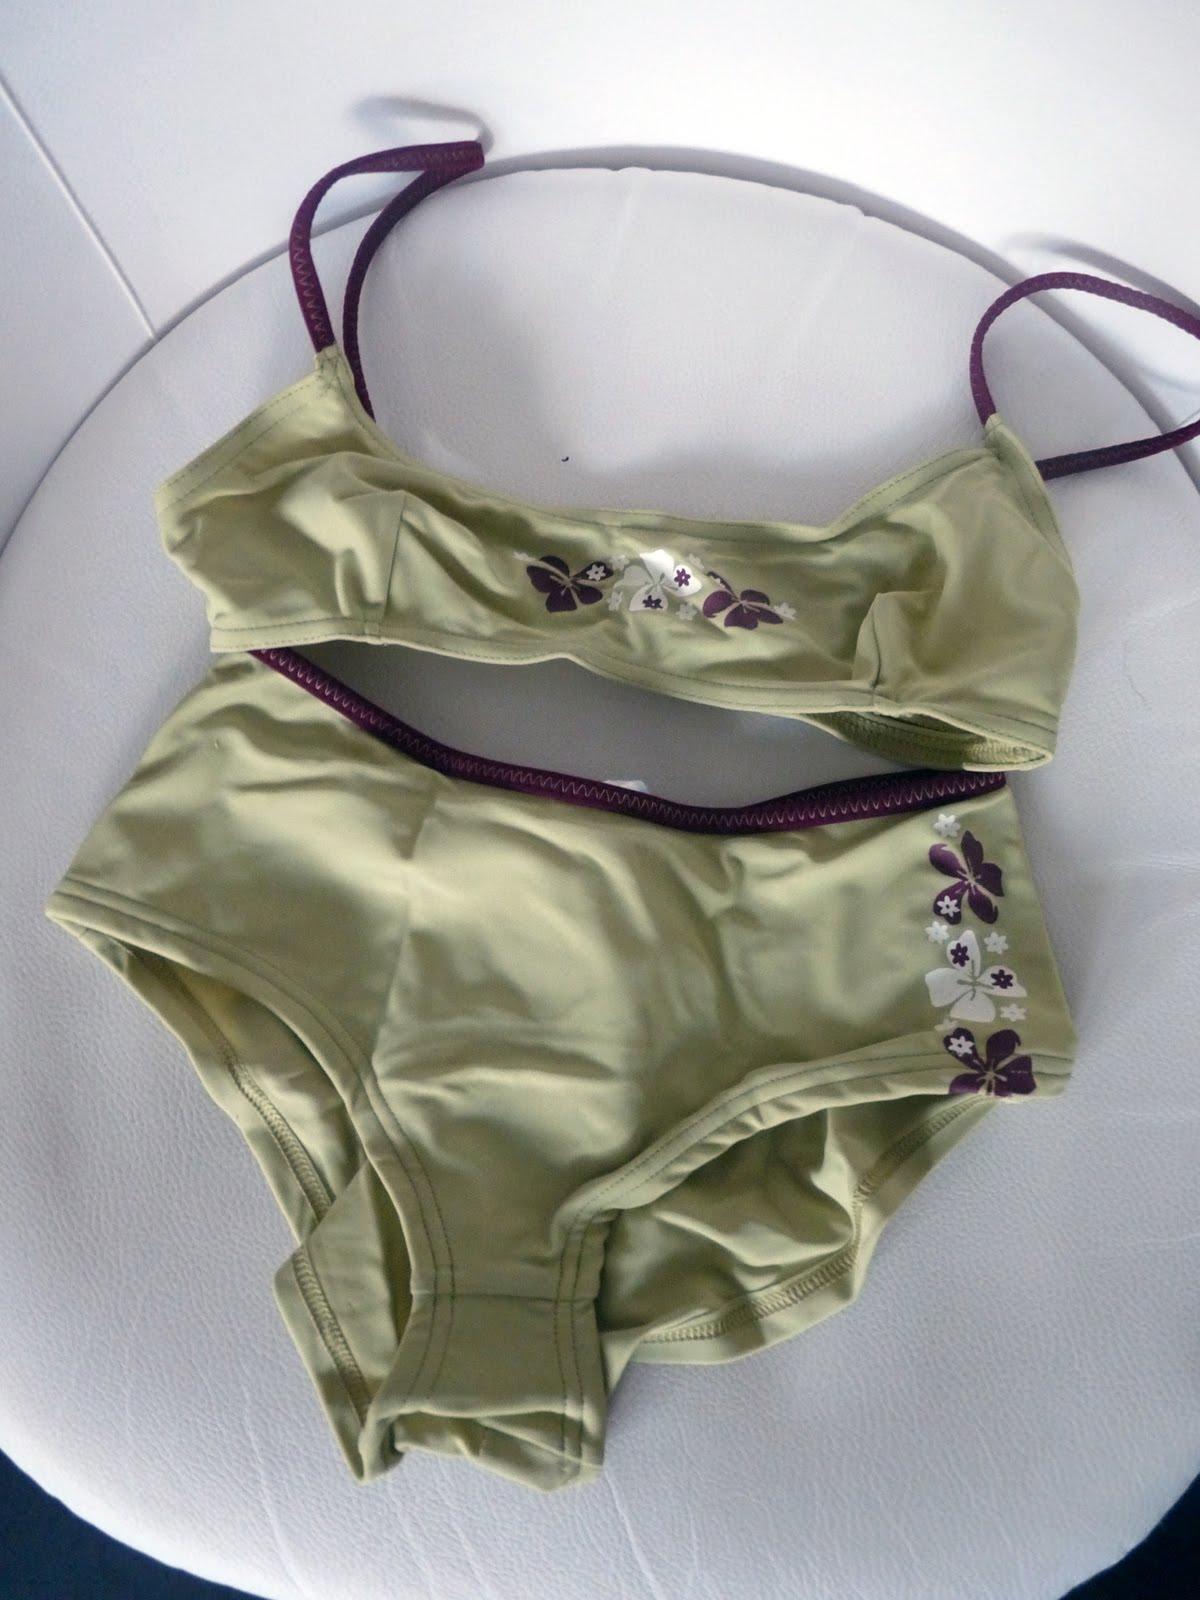 vide dressing g ant vente de maillots de bain de marque. Black Bedroom Furniture Sets. Home Design Ideas